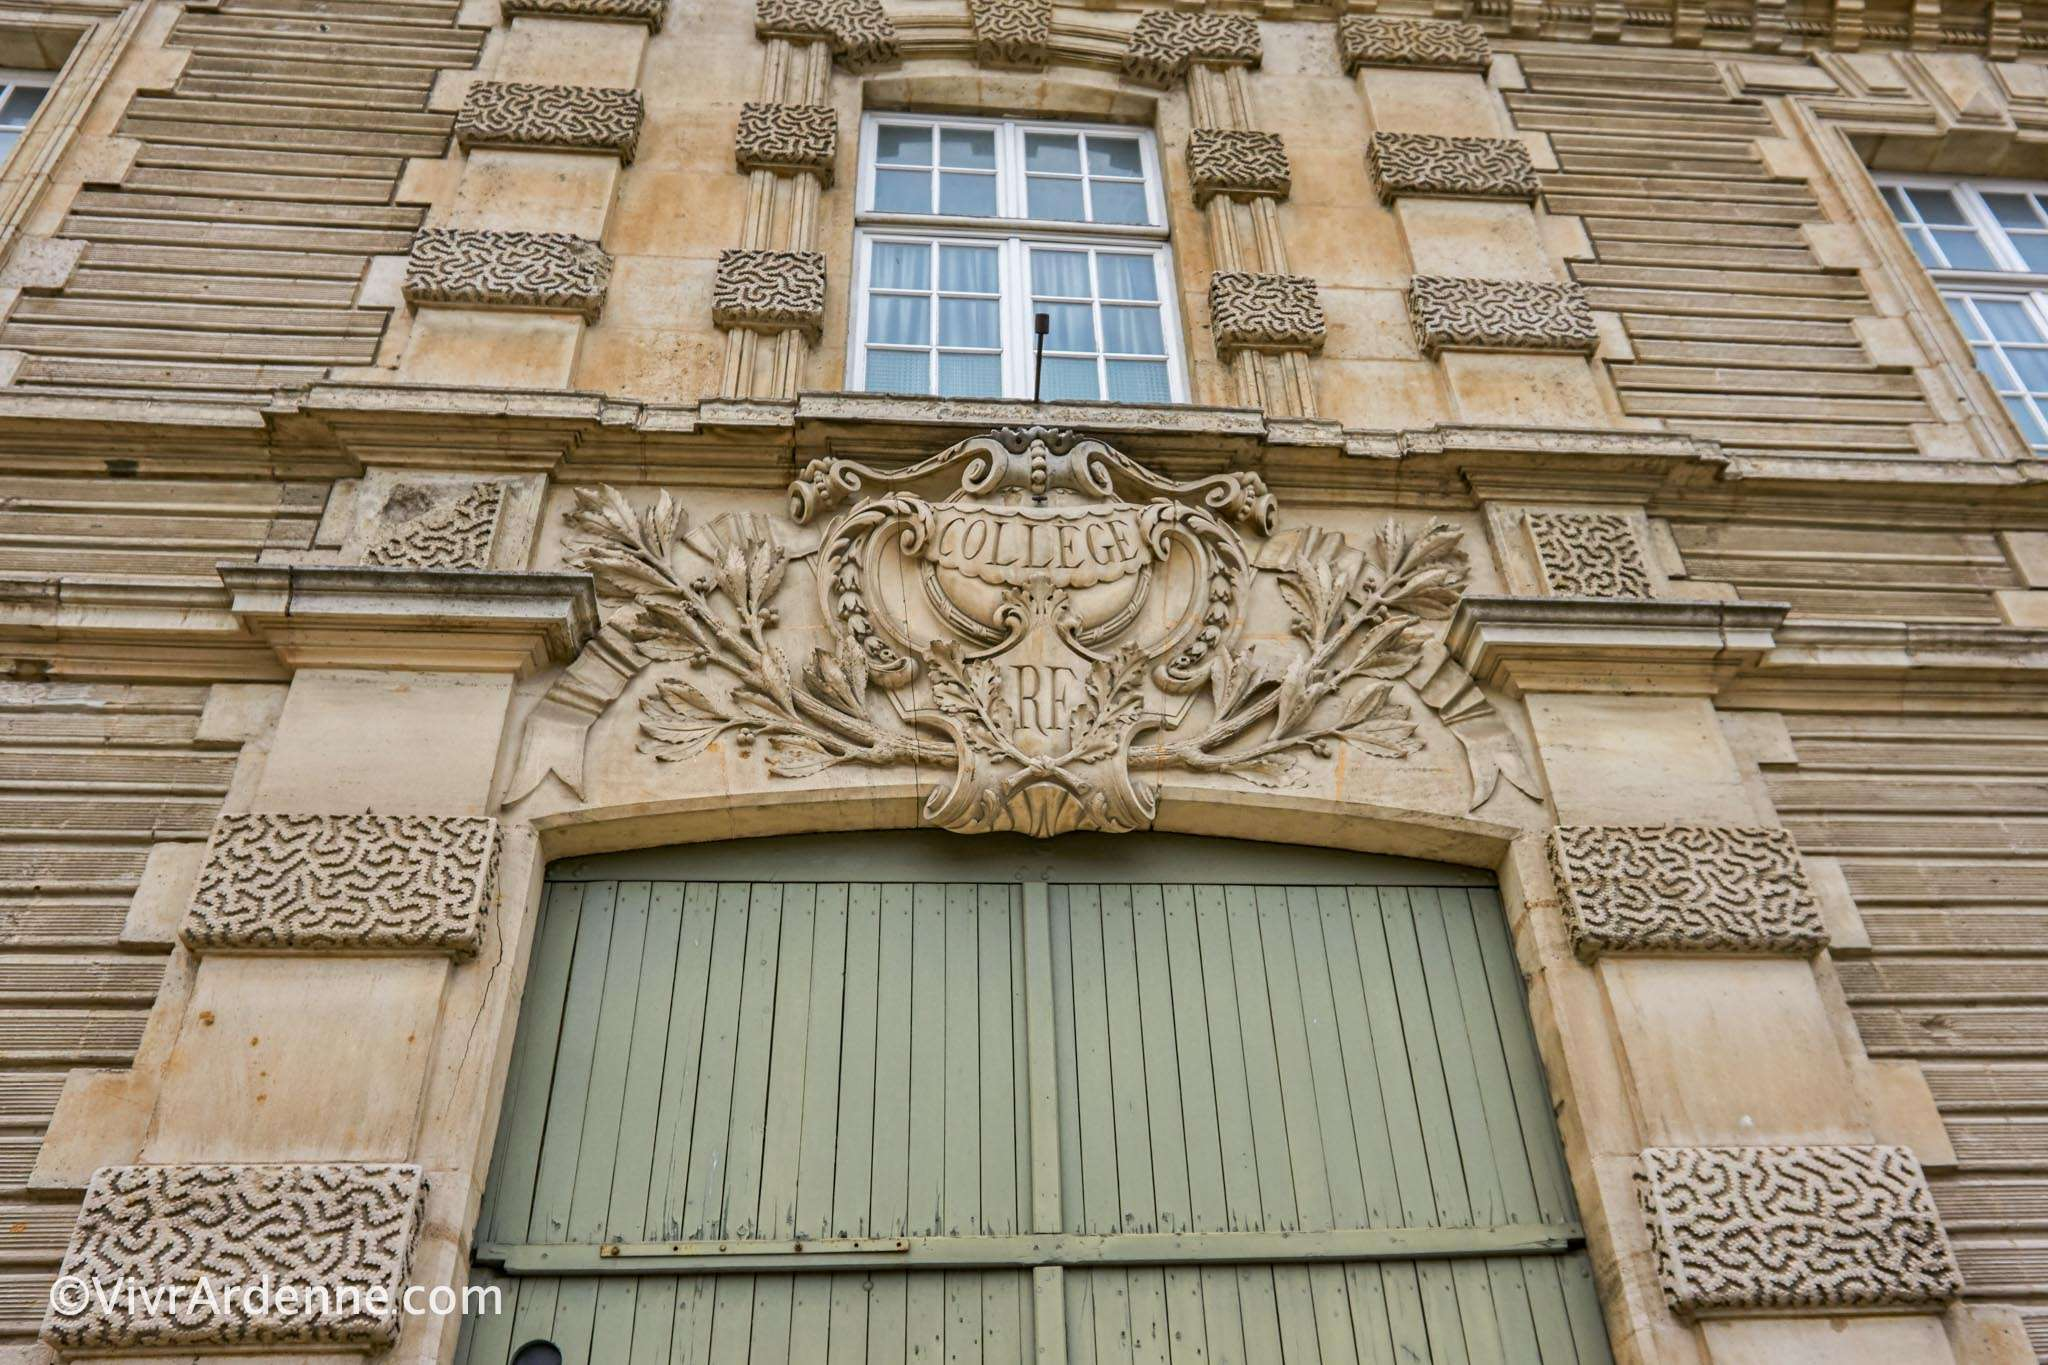 Architecture Sedan - VivrArdenne